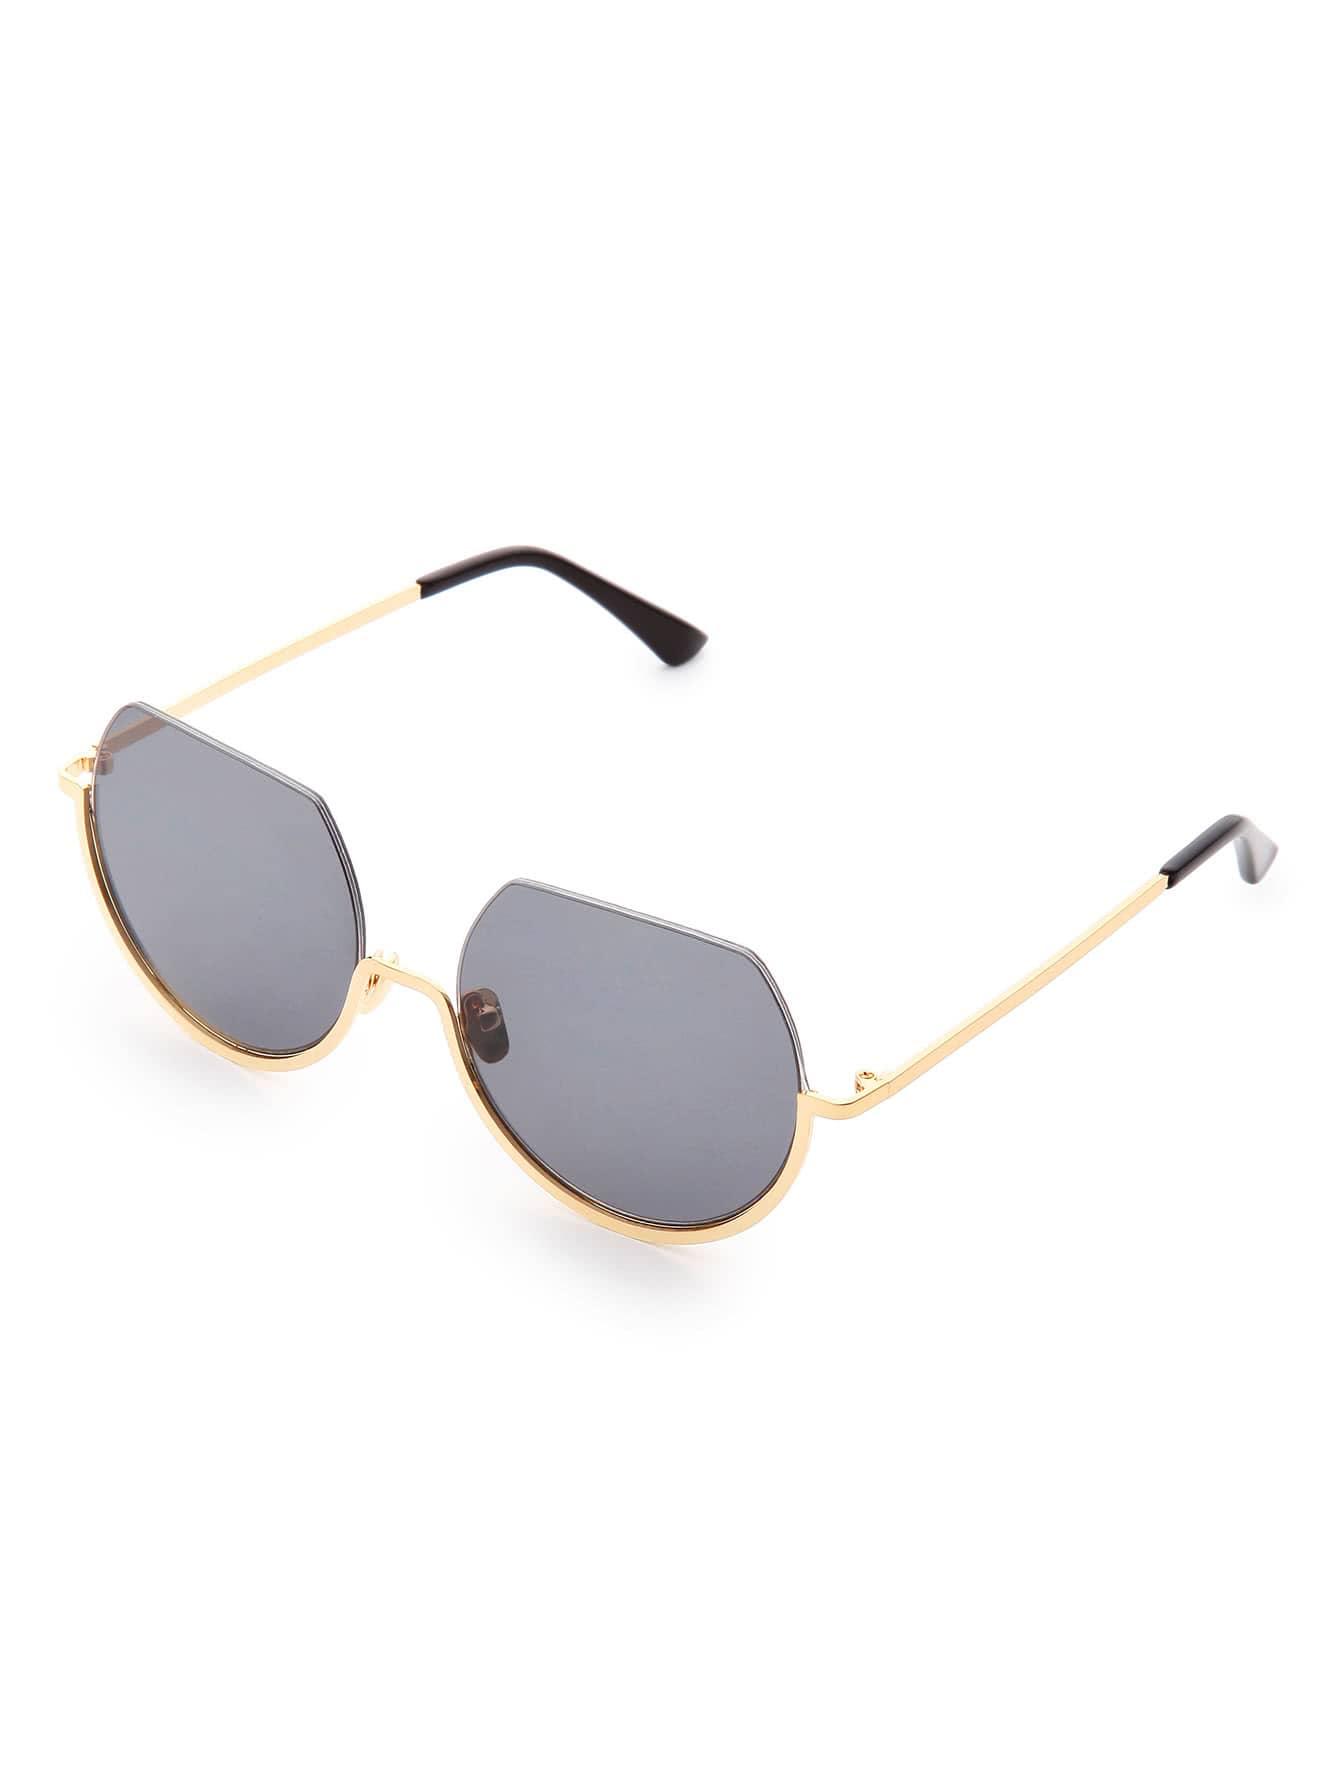 Flat Top Metal Frame Round Sunglasses